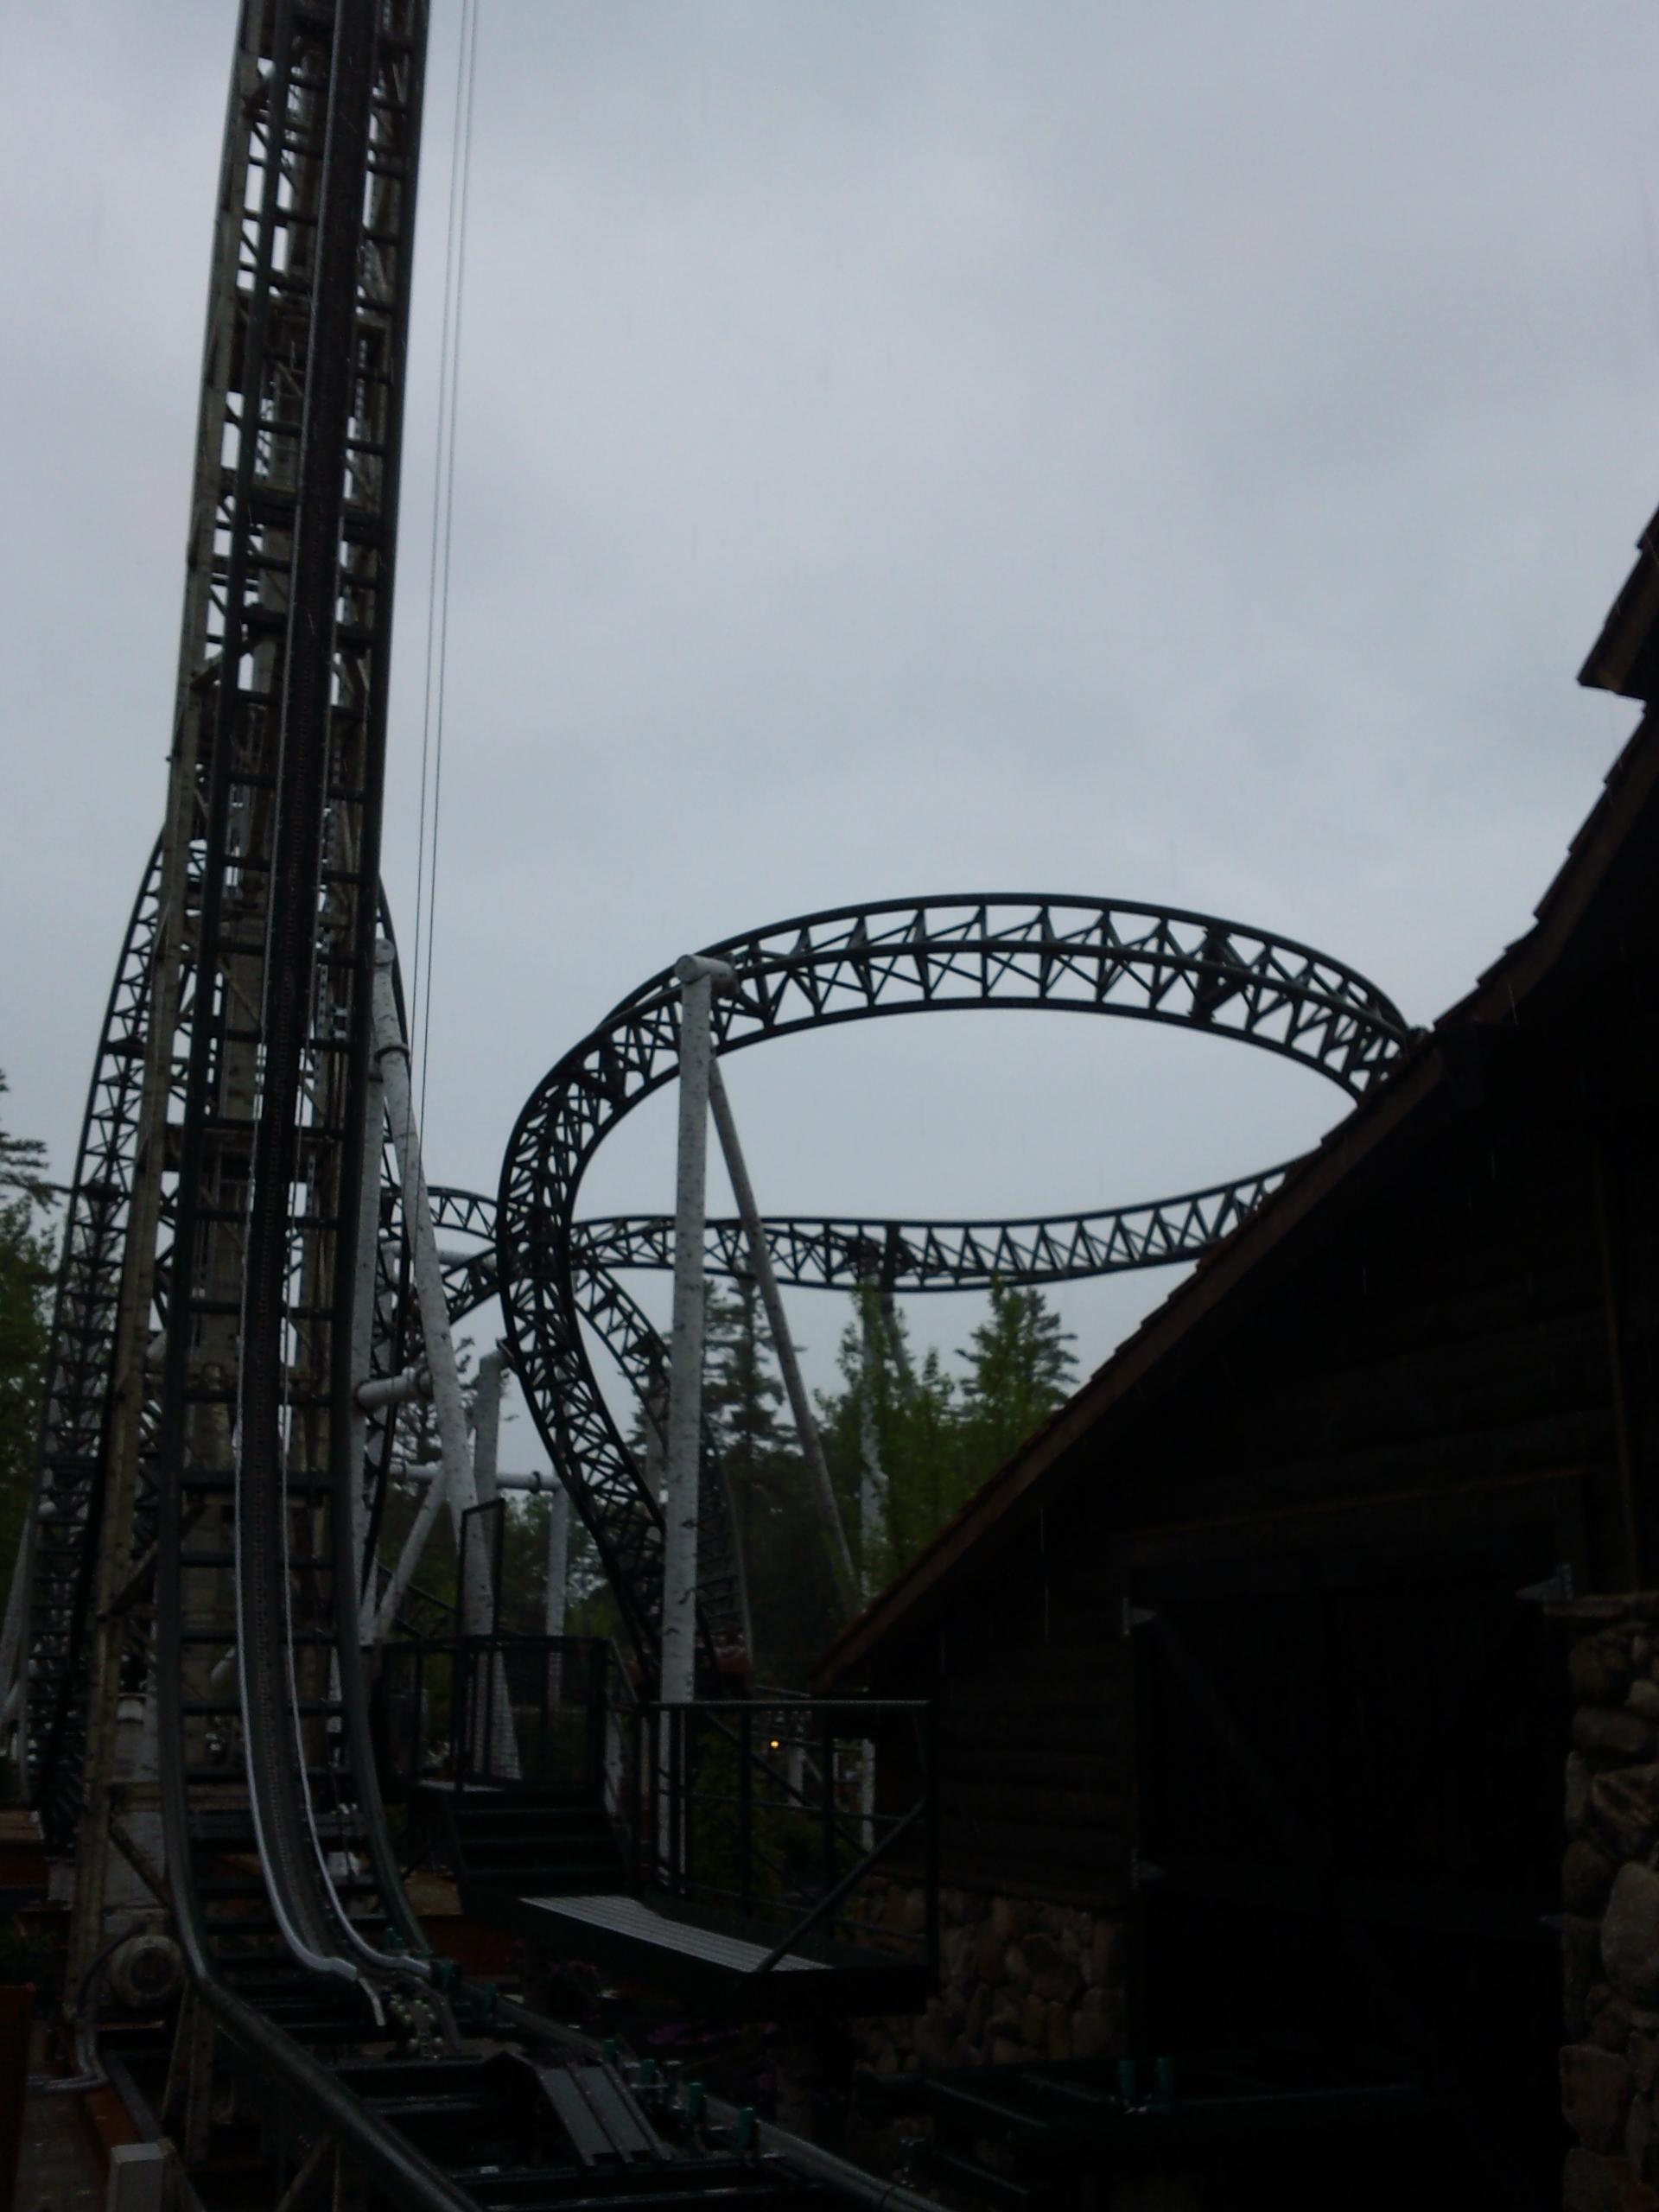 2011-06-11-11-59-15